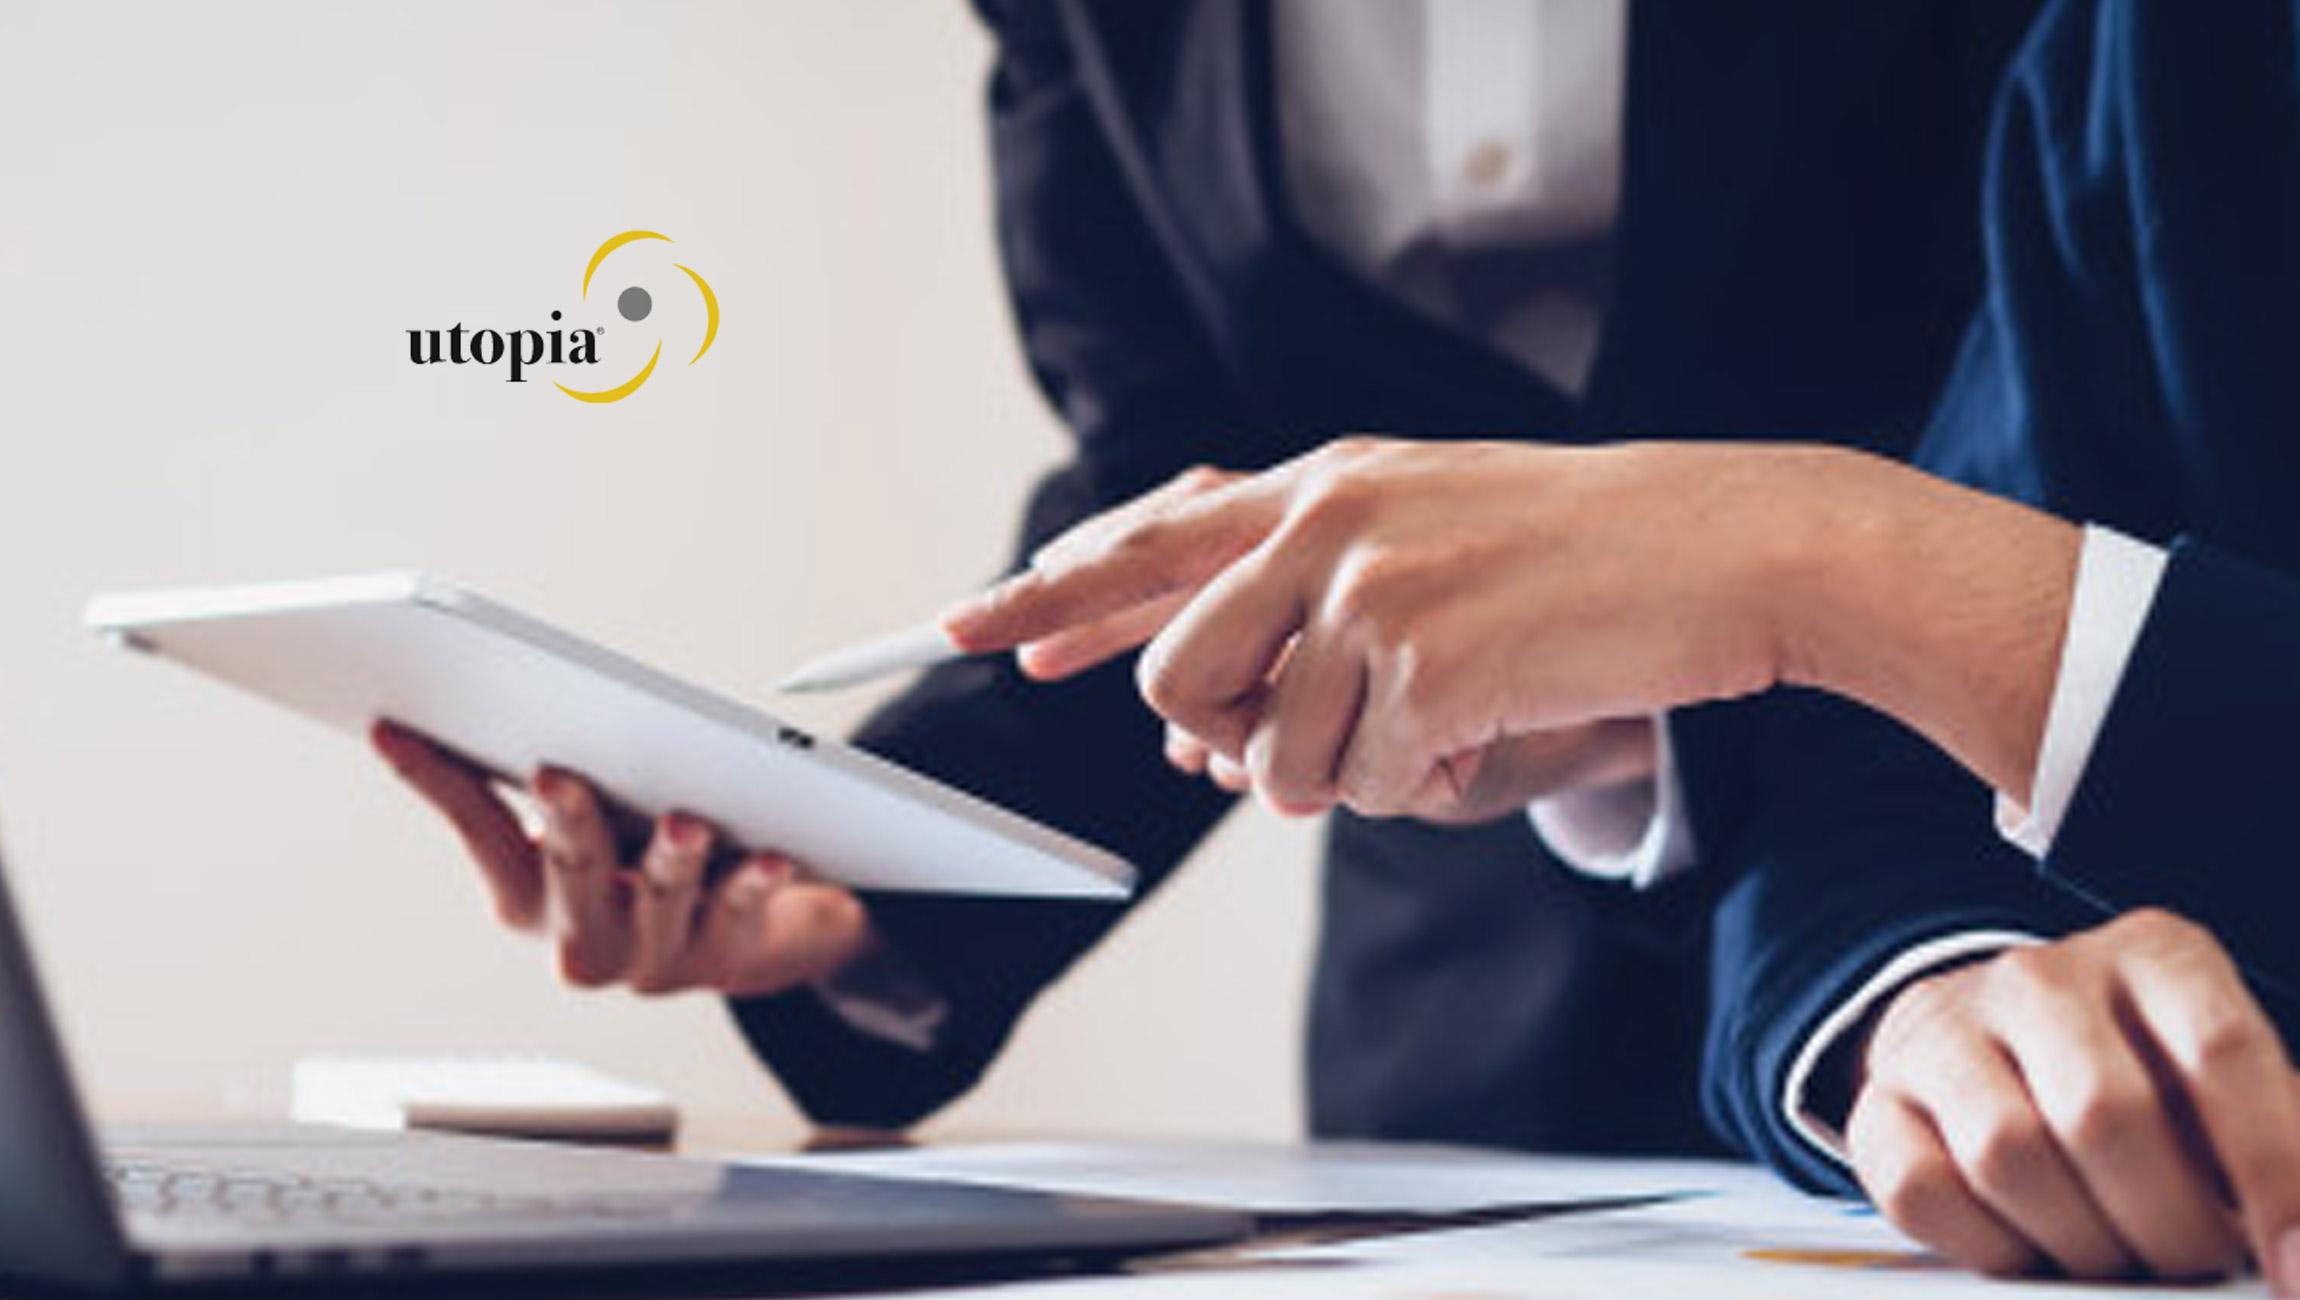 Utopia Global, Inc. Names Former SAP Executive, Dr. Kevin Attard as President, Utopia International